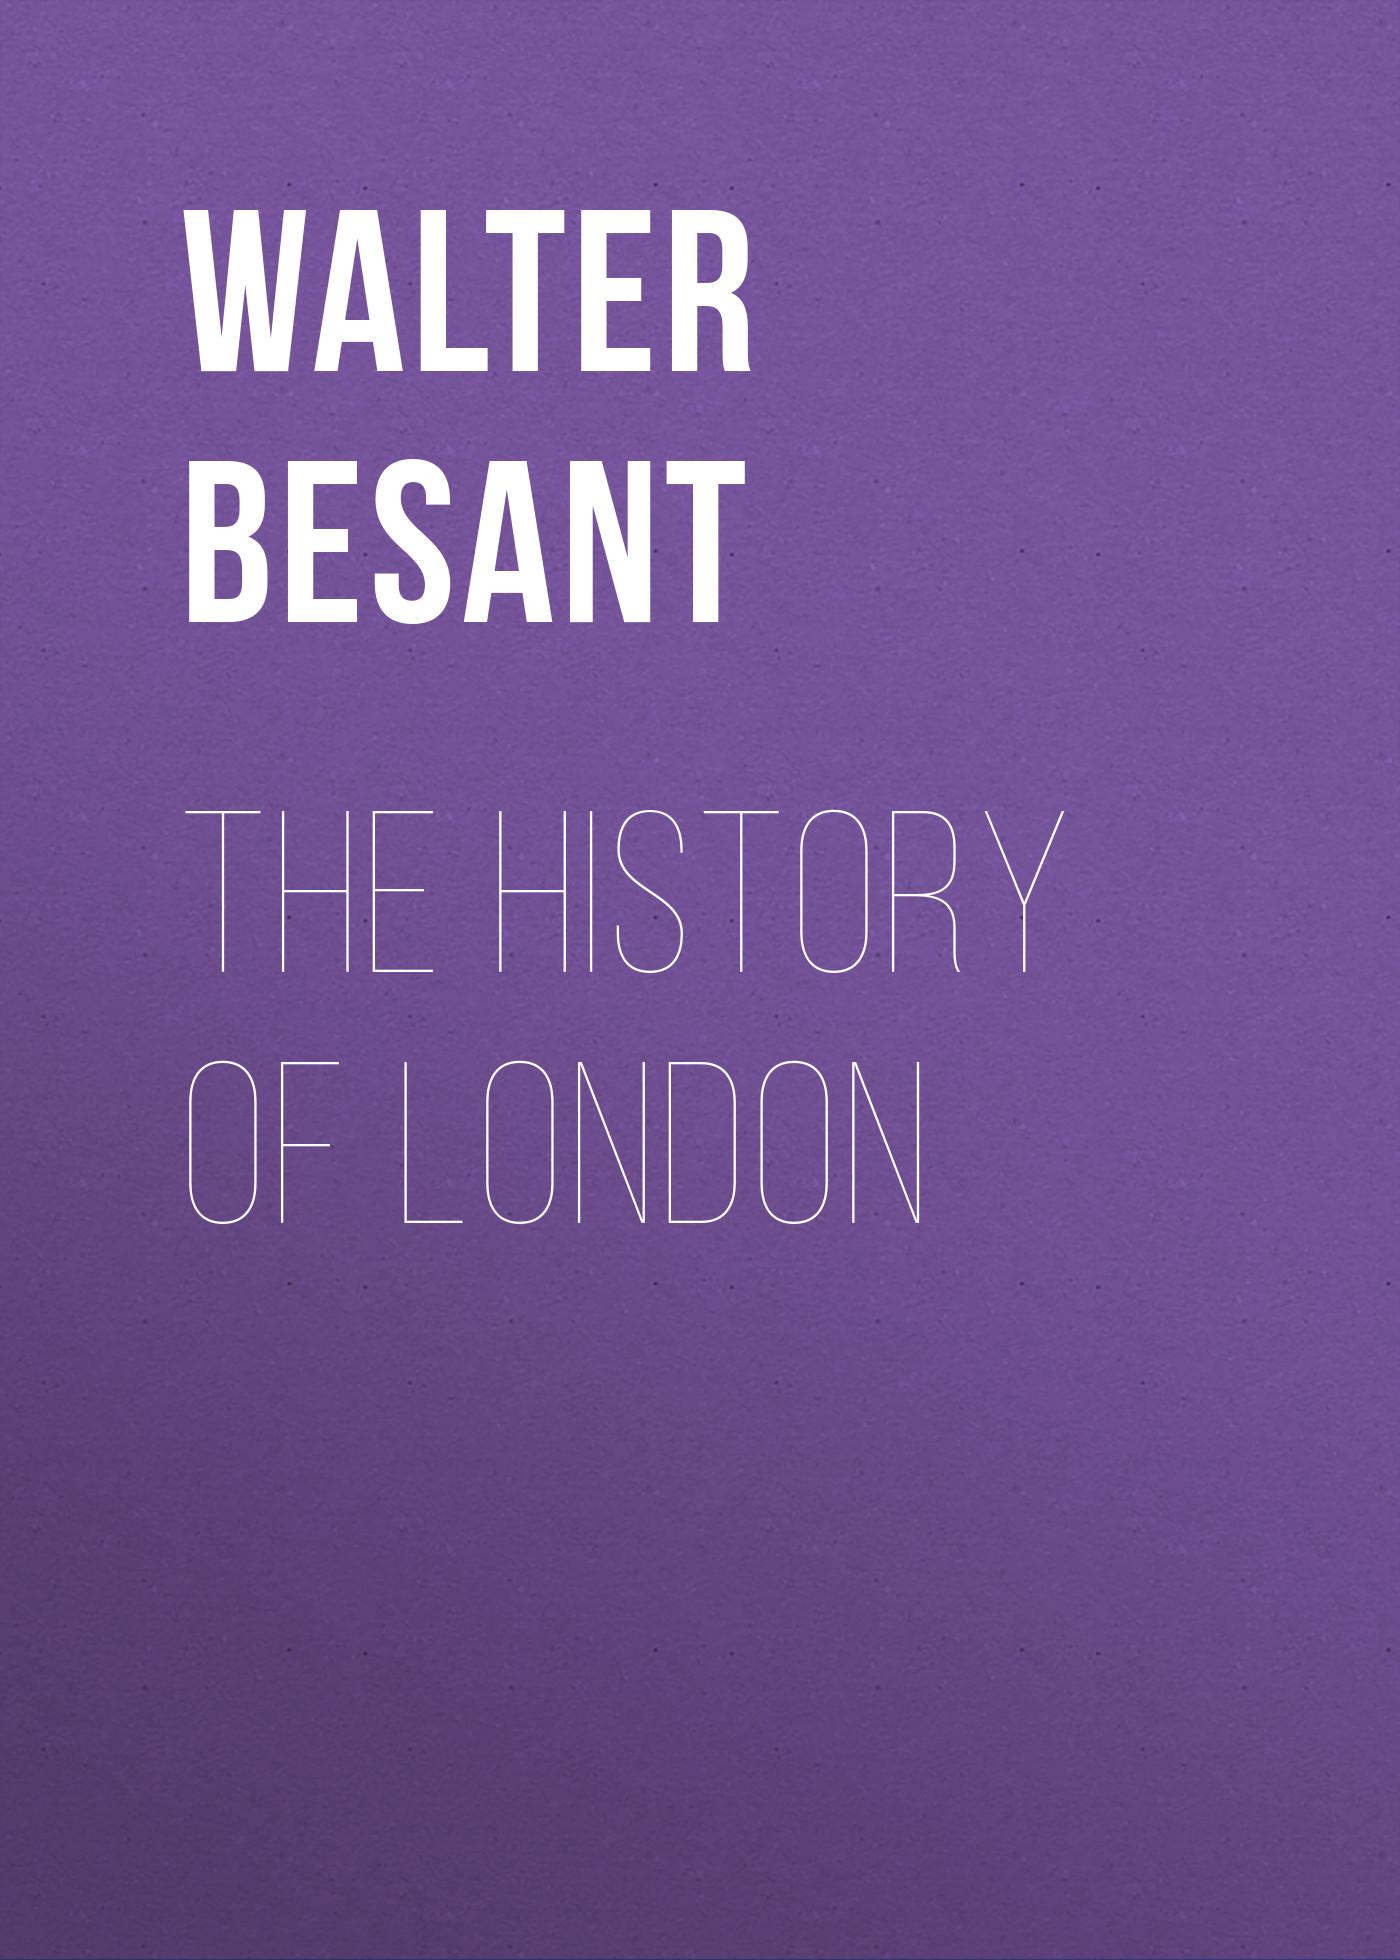 все цены на Walter Besant The History of London онлайн